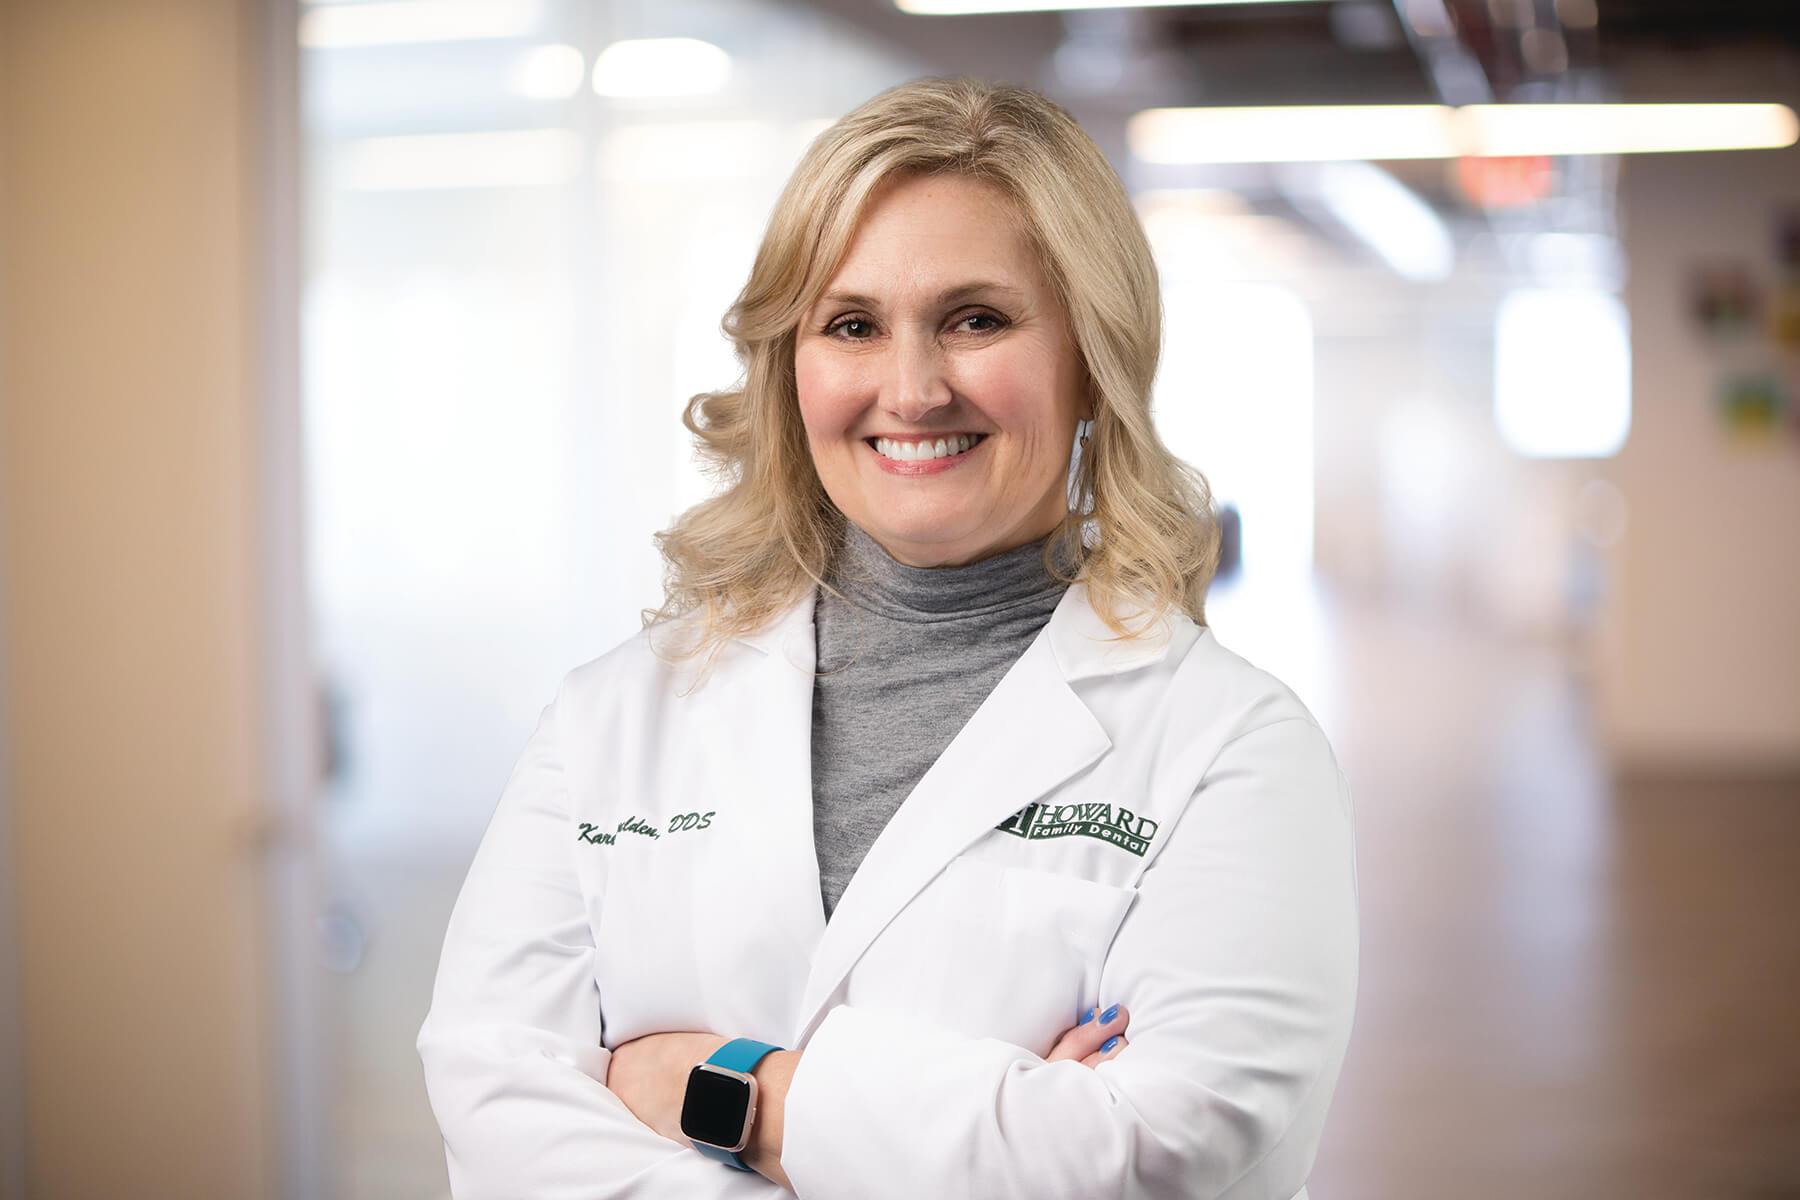 Dr. Karen Goulden